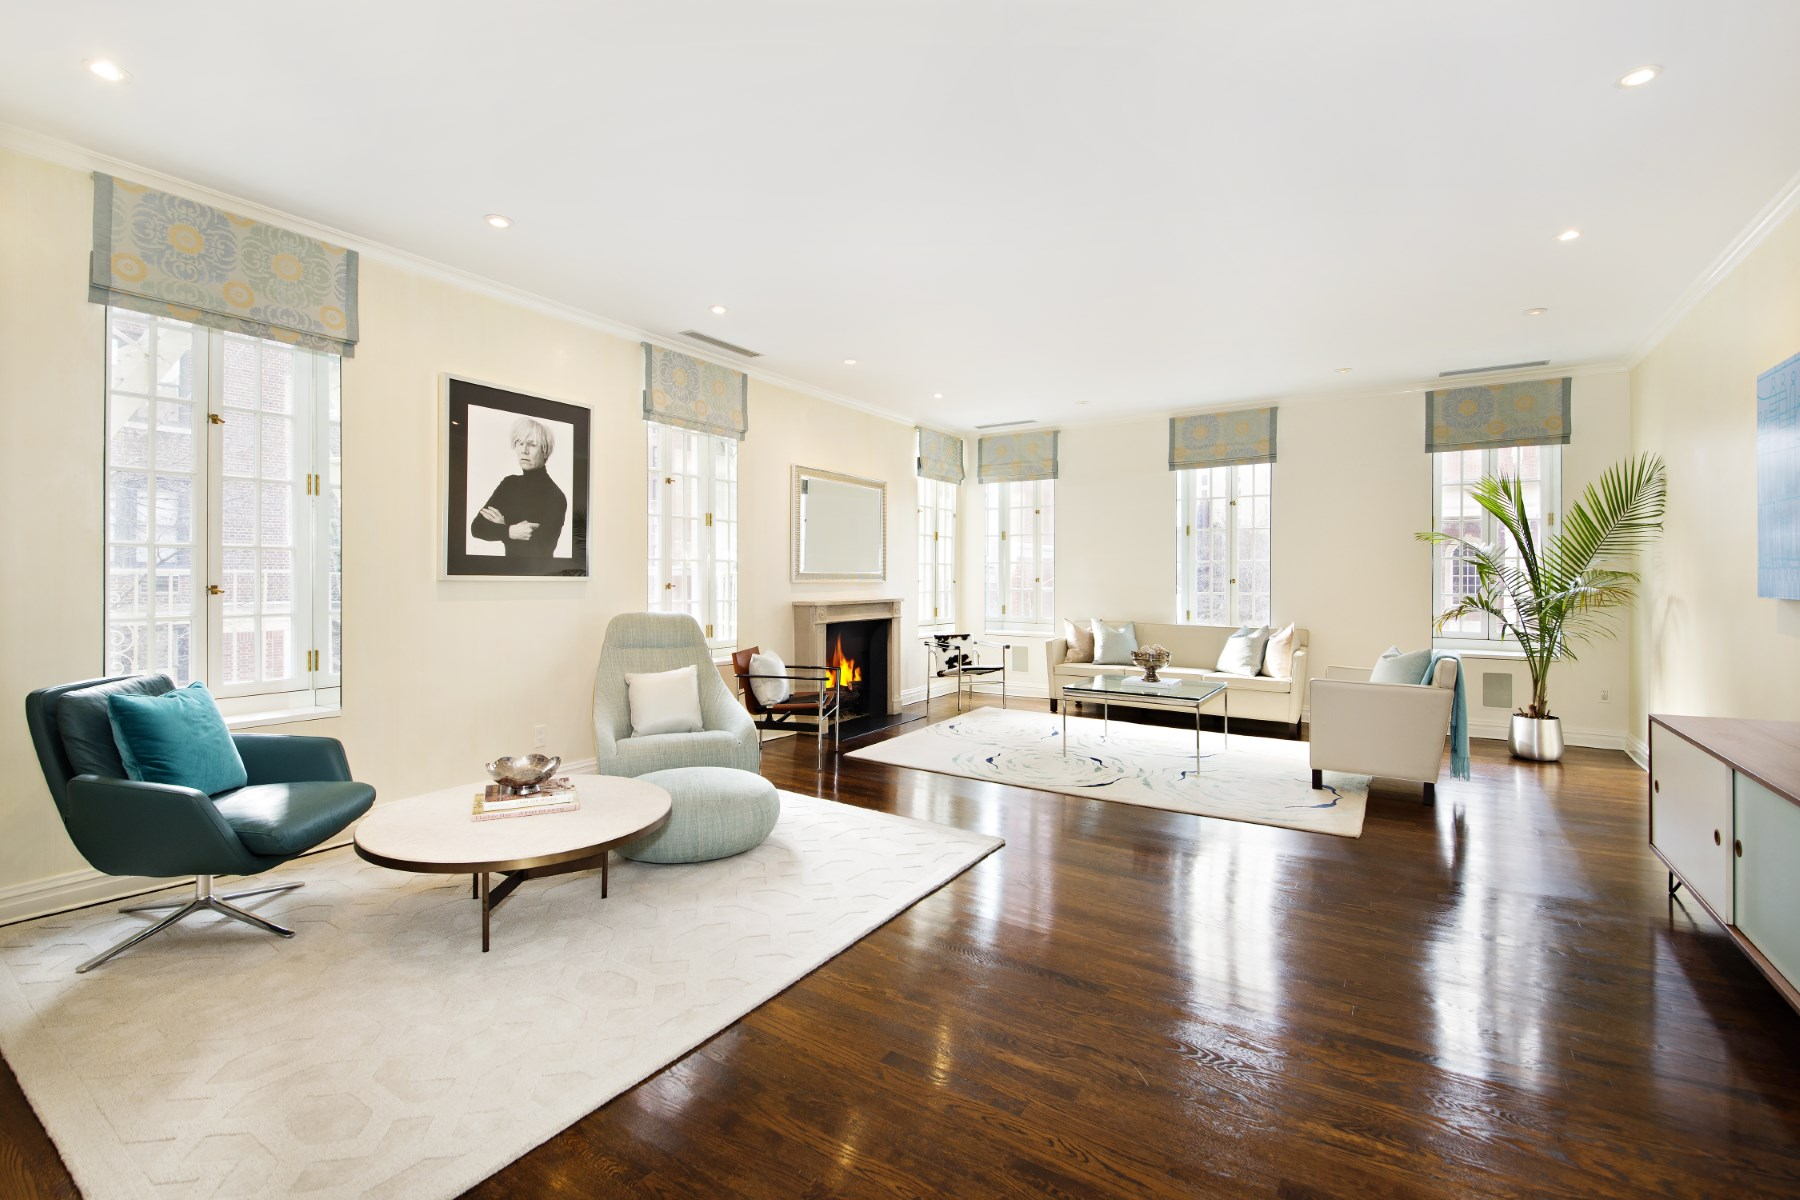 Таунхаус для того Продажа на 1141 Park Avenue Upper East Side, New York, Нью-Йорк, 10128 Соединенные Штаты